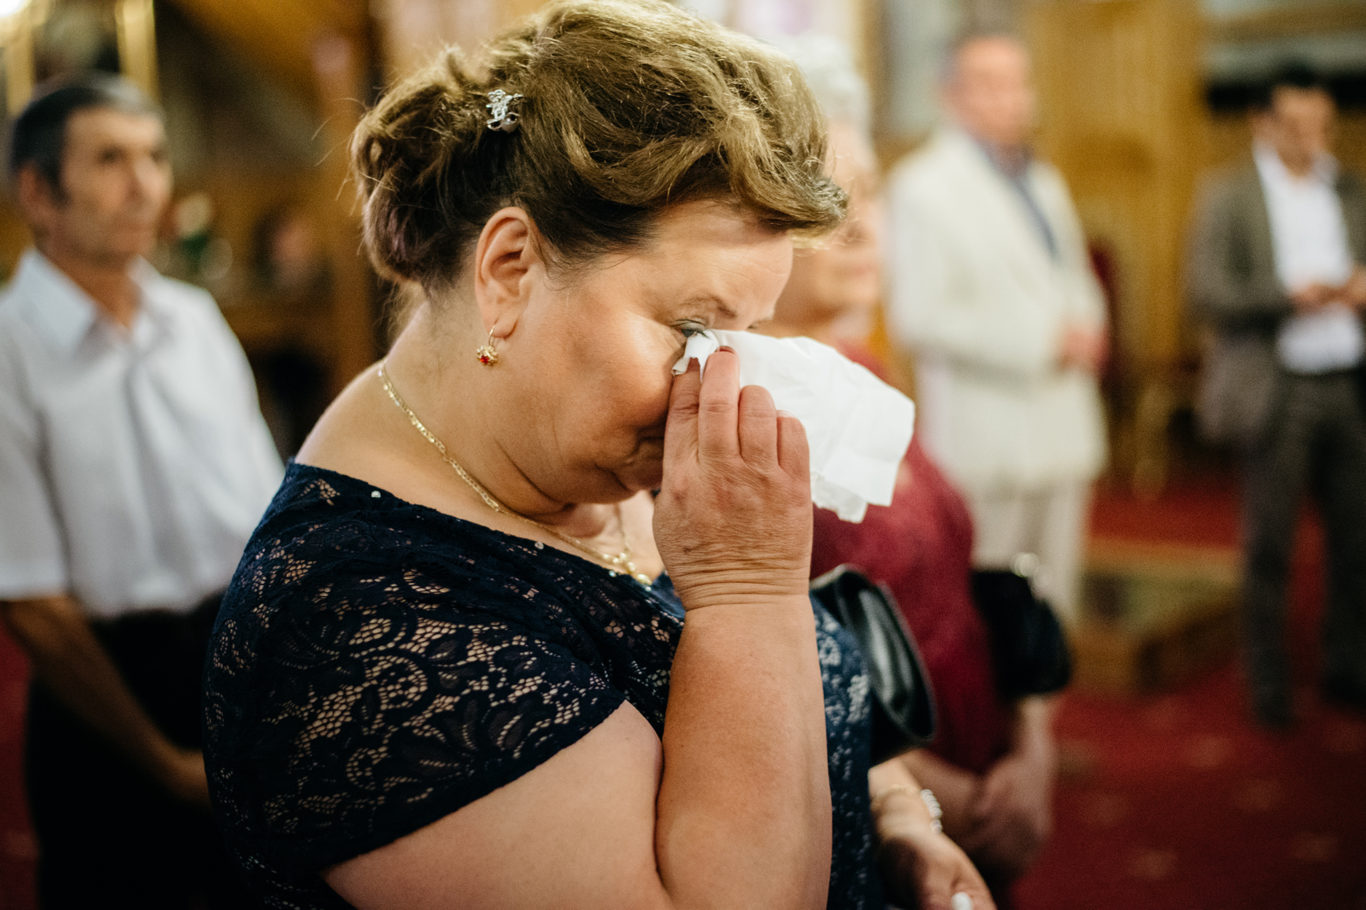 0393-fotografie-nunta-bucuresti-anca-george-fotograf-ciprian-dumitrescu-dsc_8616